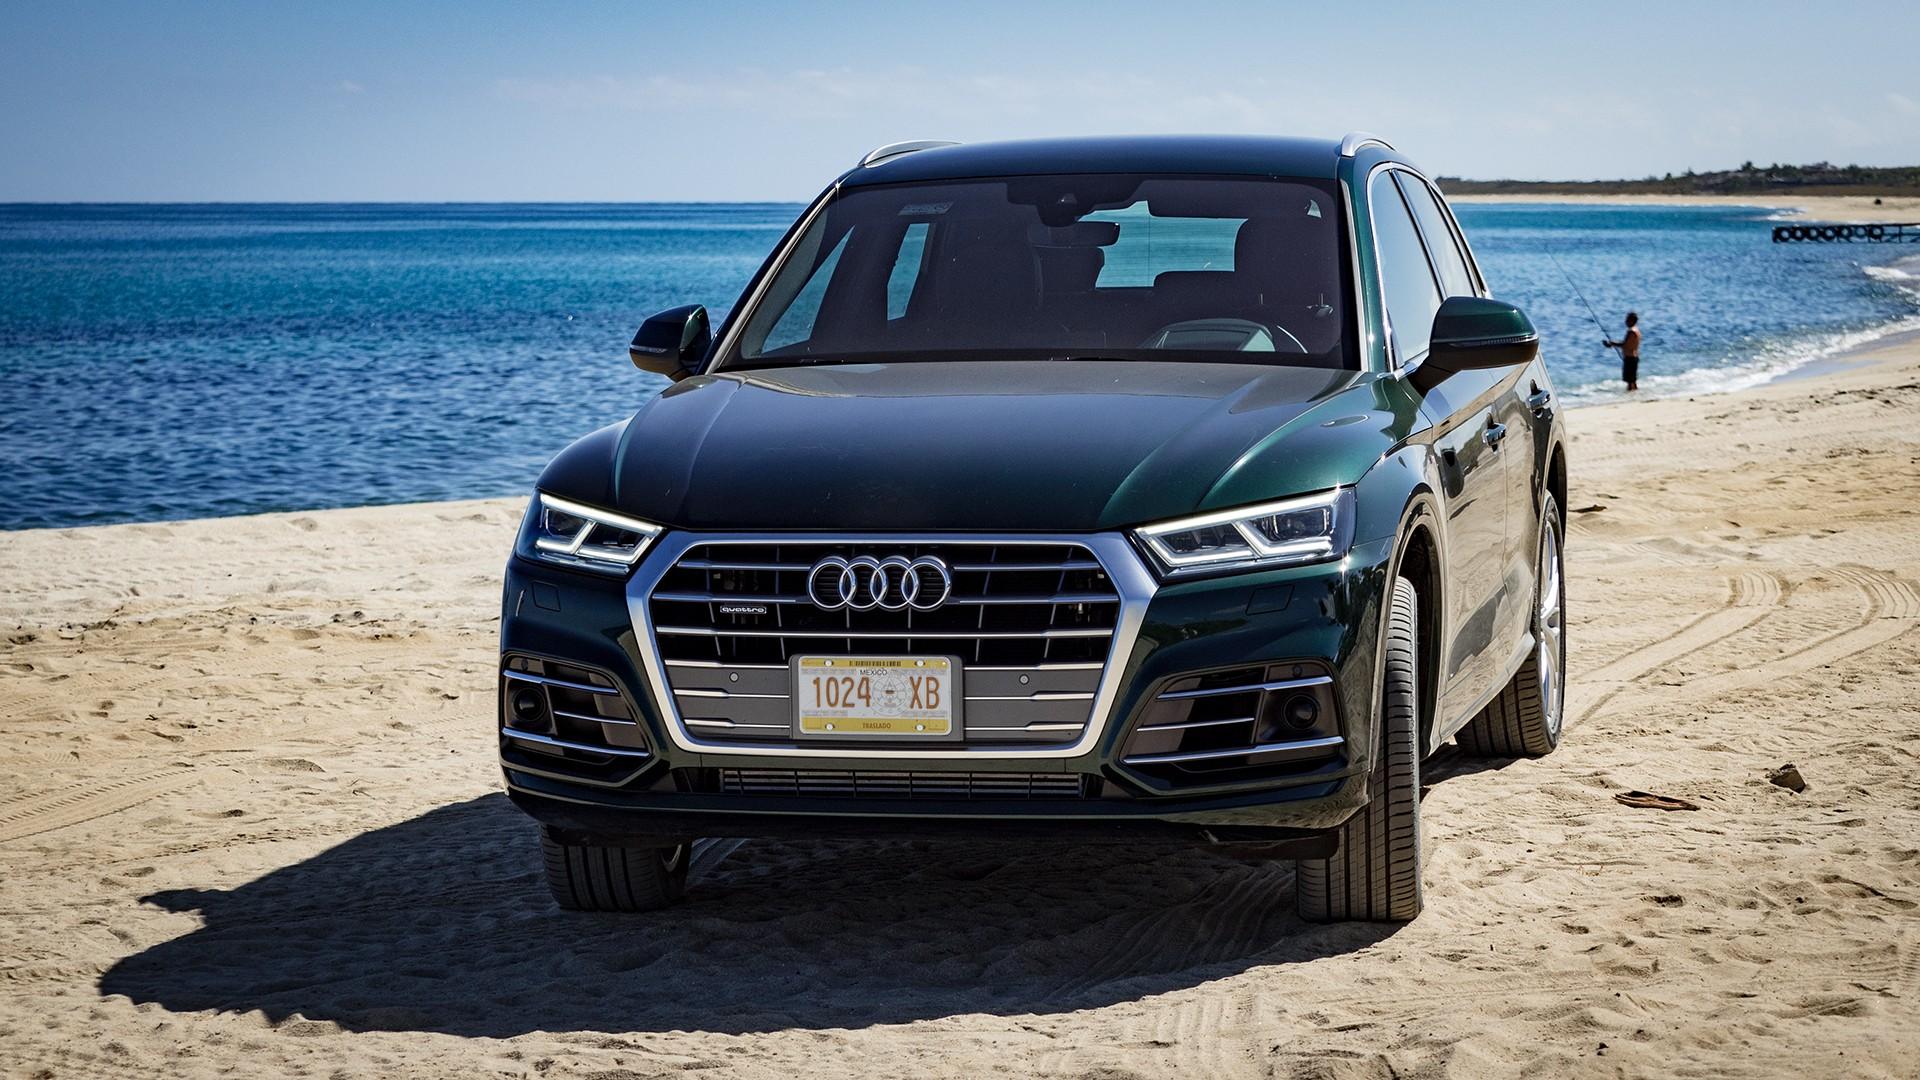 Audi Q5 - Frontansicht - Bild: Sandra Schink